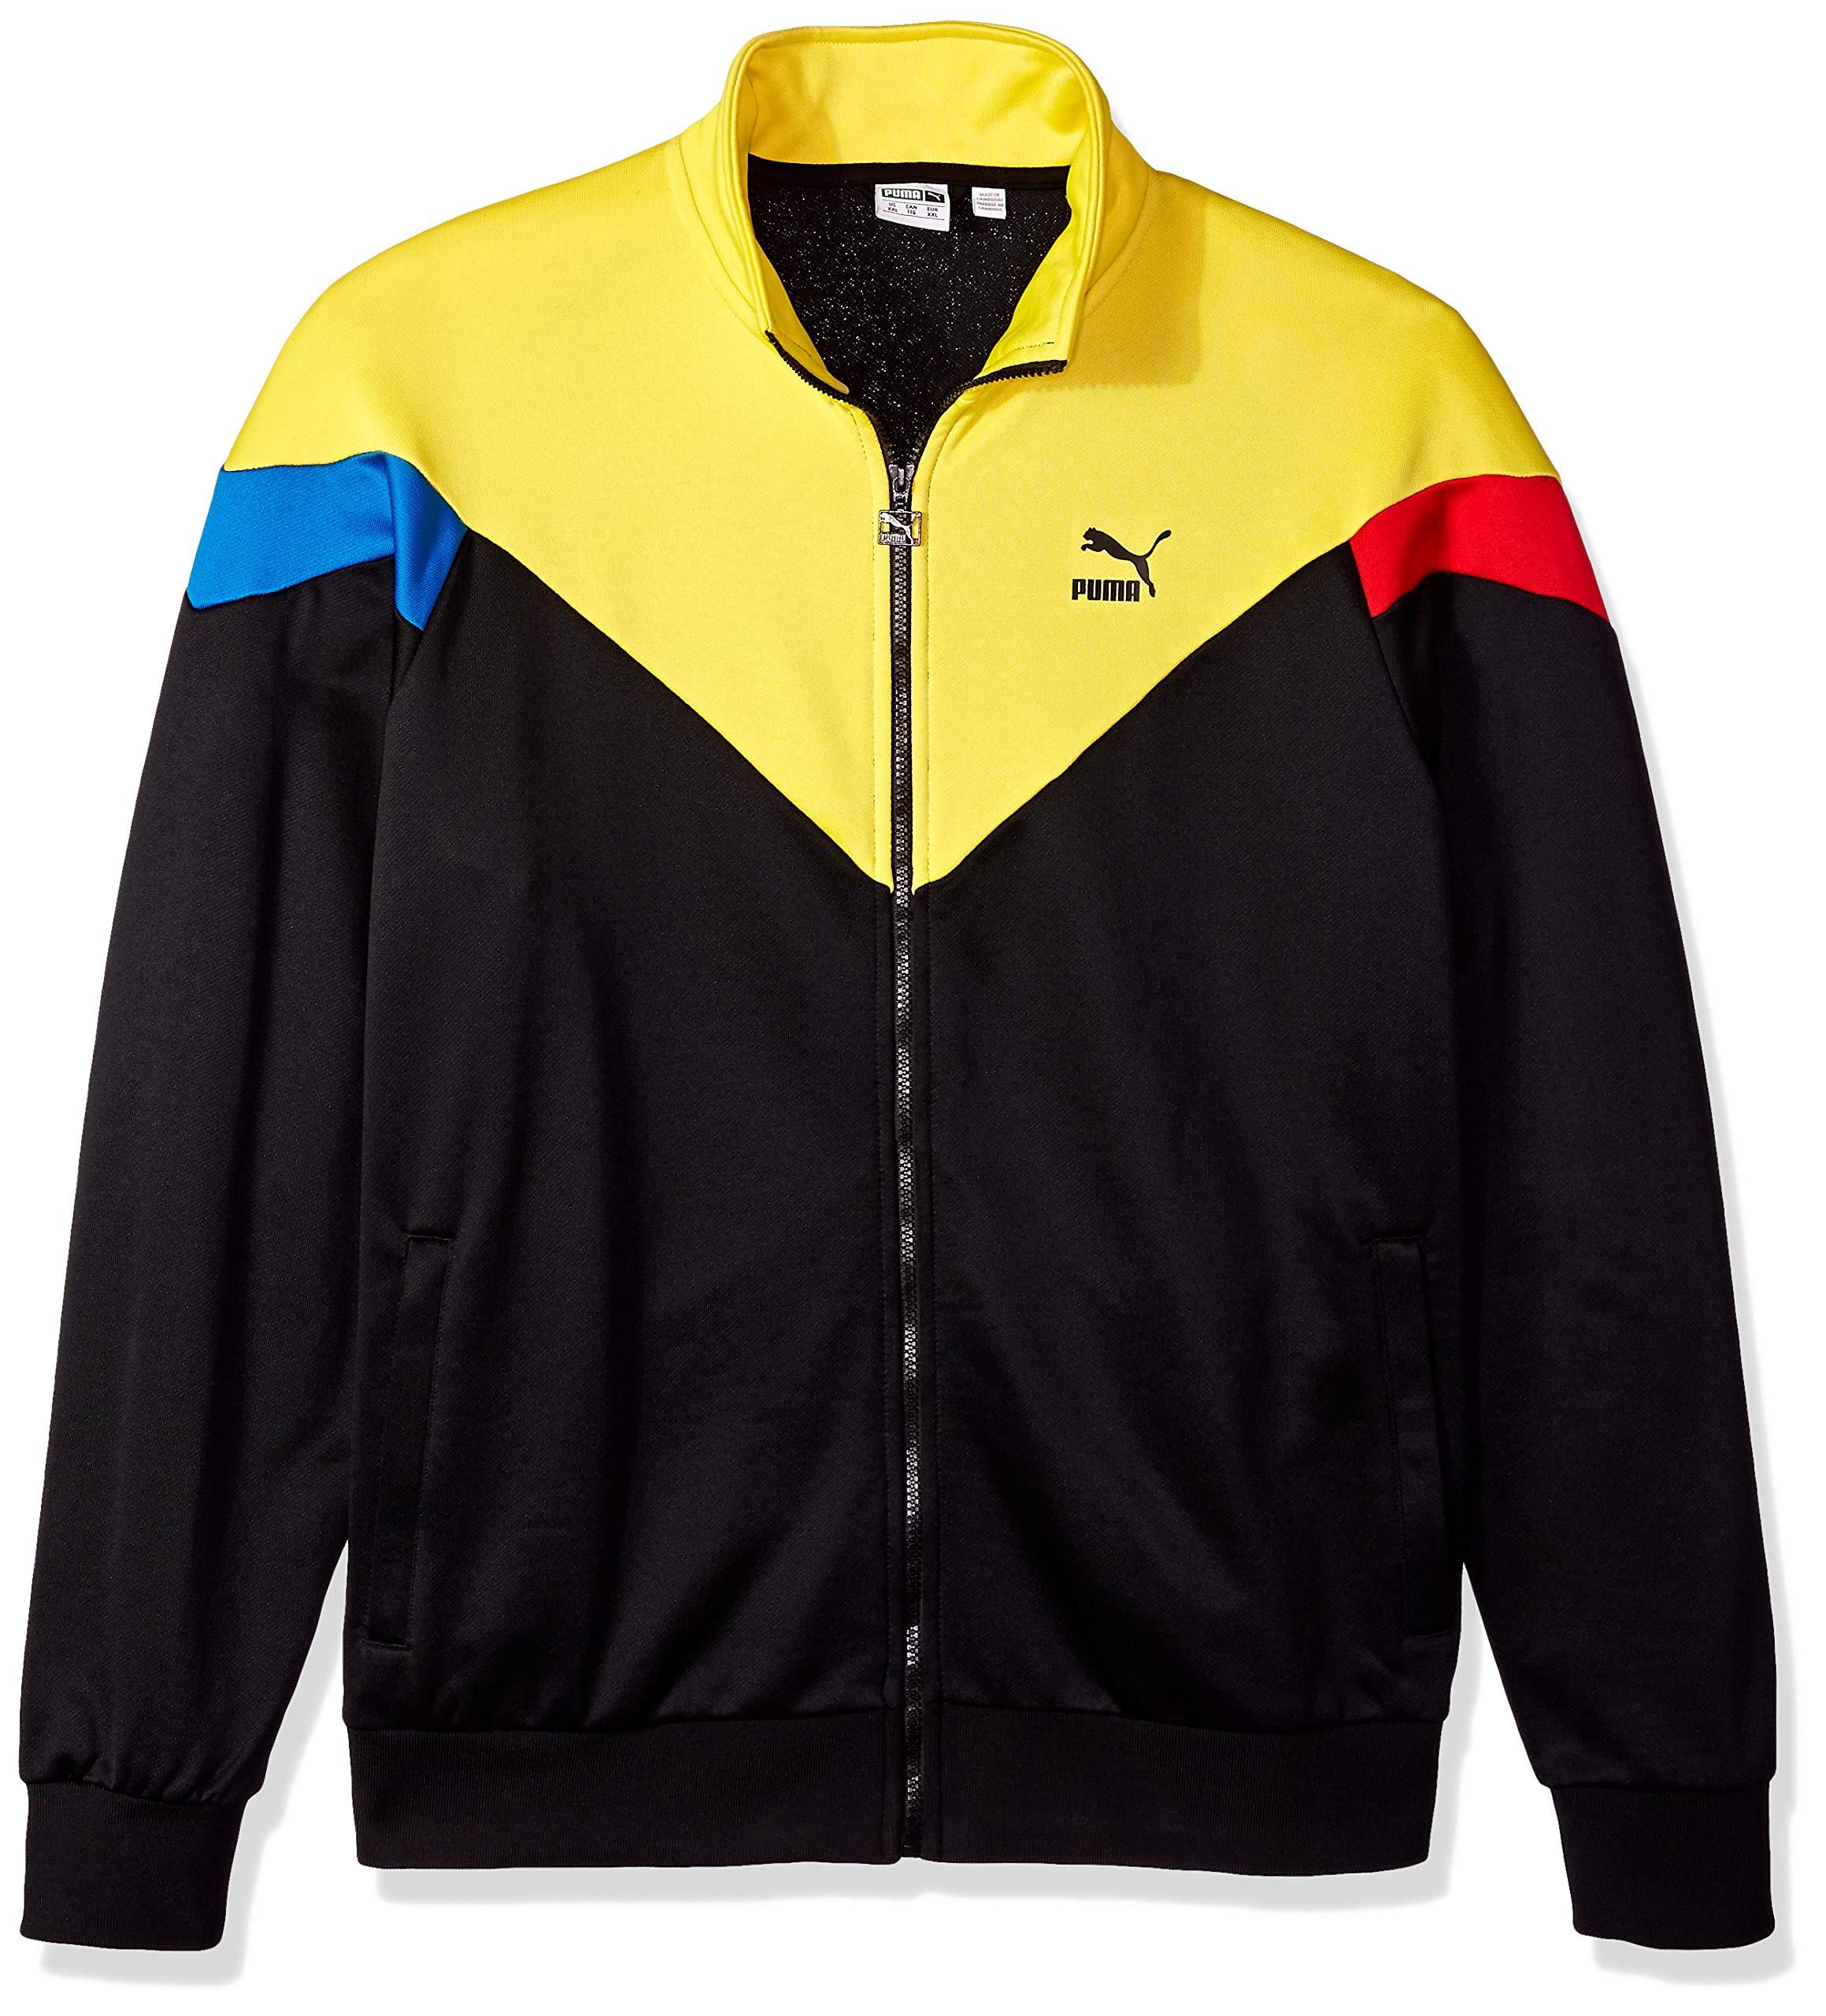 PUMA Men's MCS Track Jacket, Black/Yellow, M by PUMA